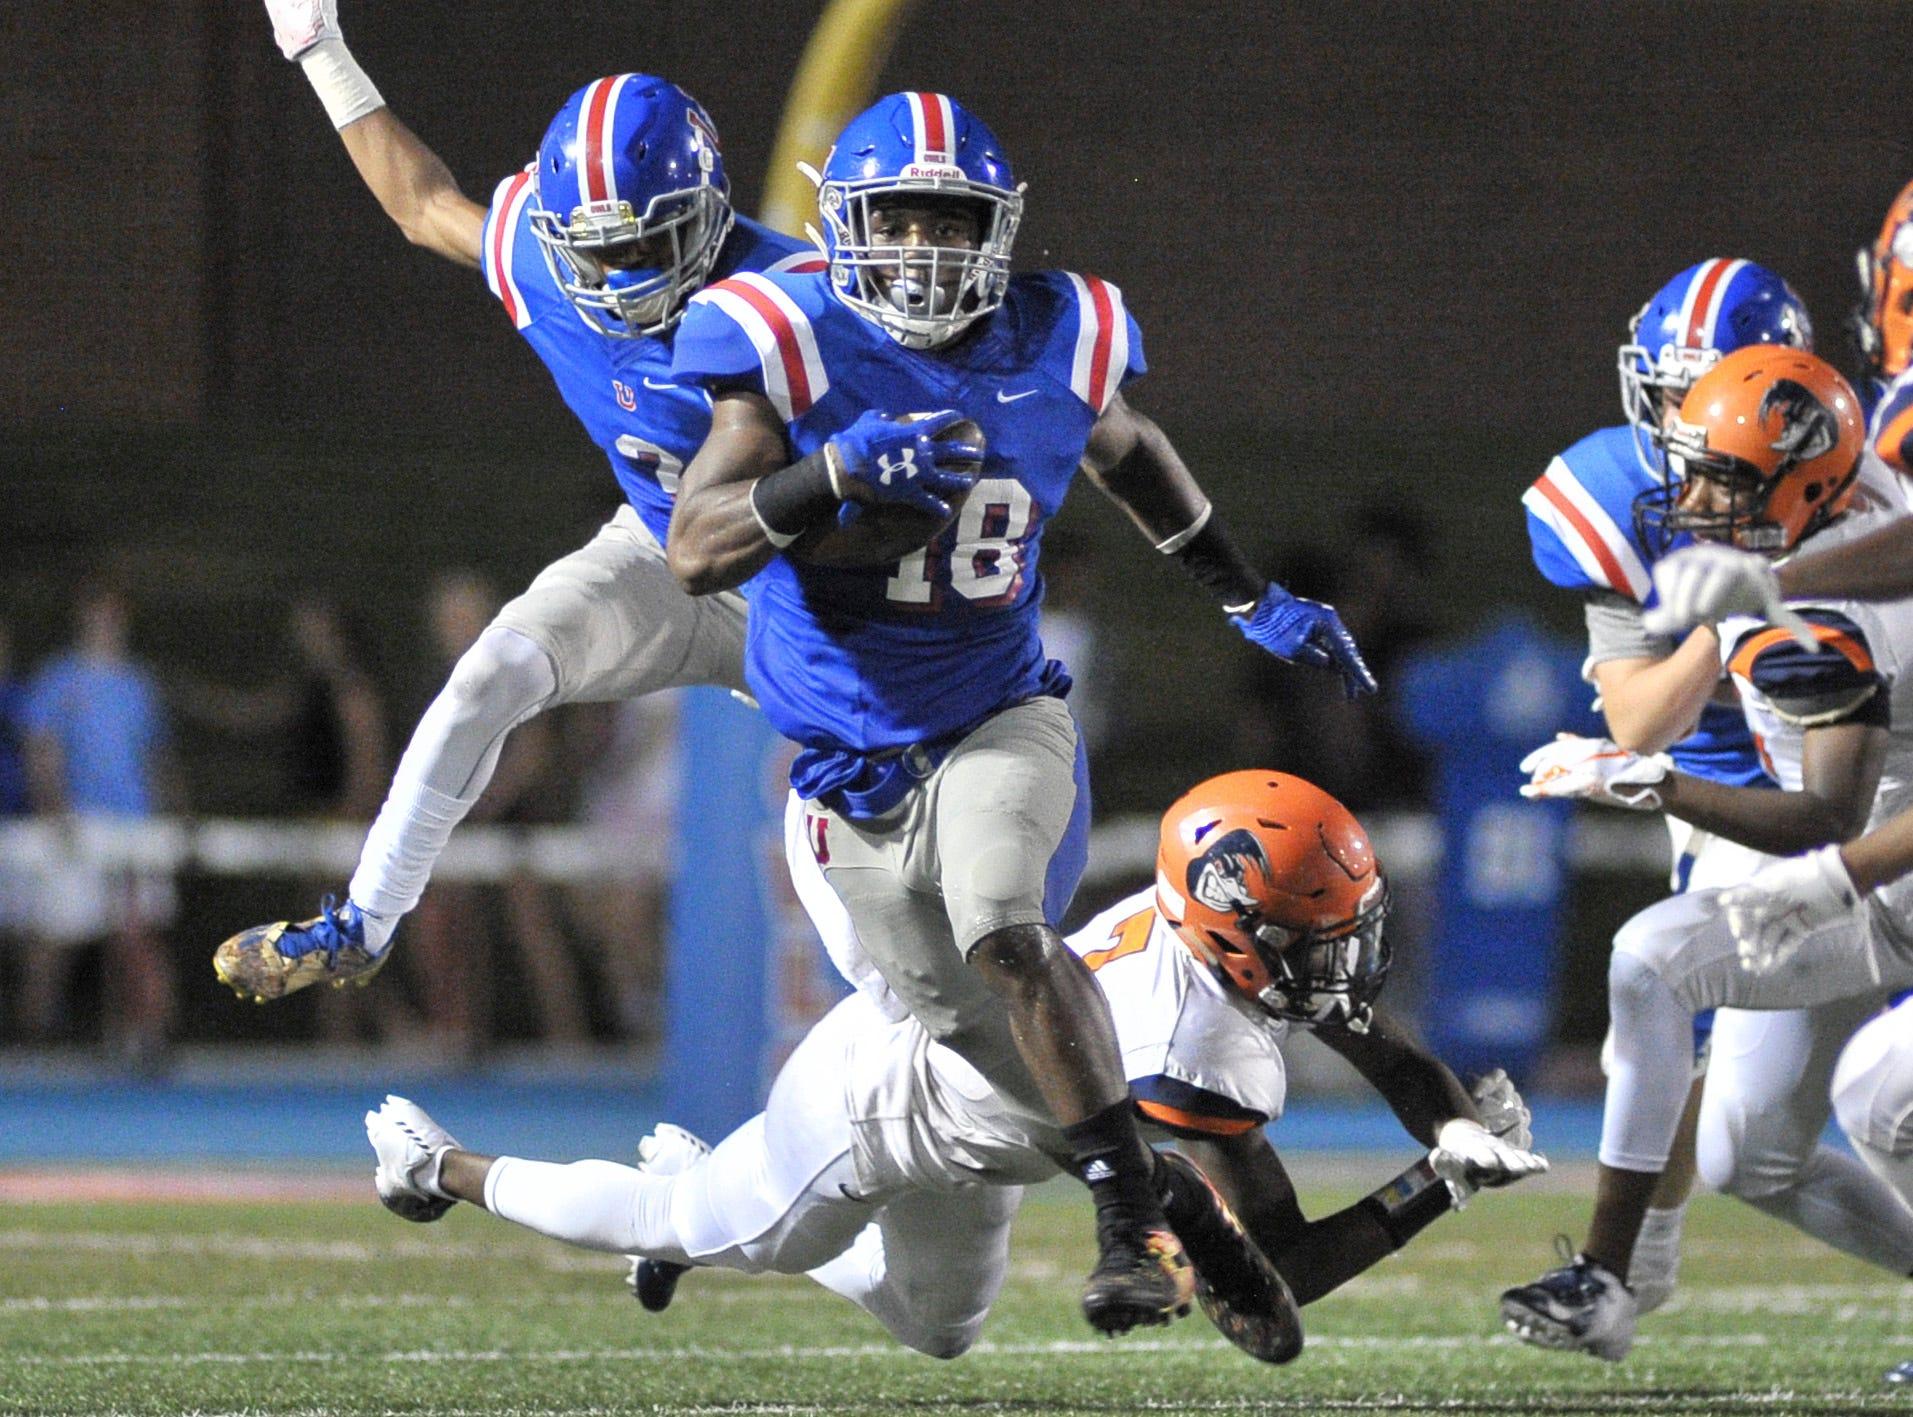 Memphis University School's Maurice Hampton carries the ball against Ridgeway at Memphis University School.